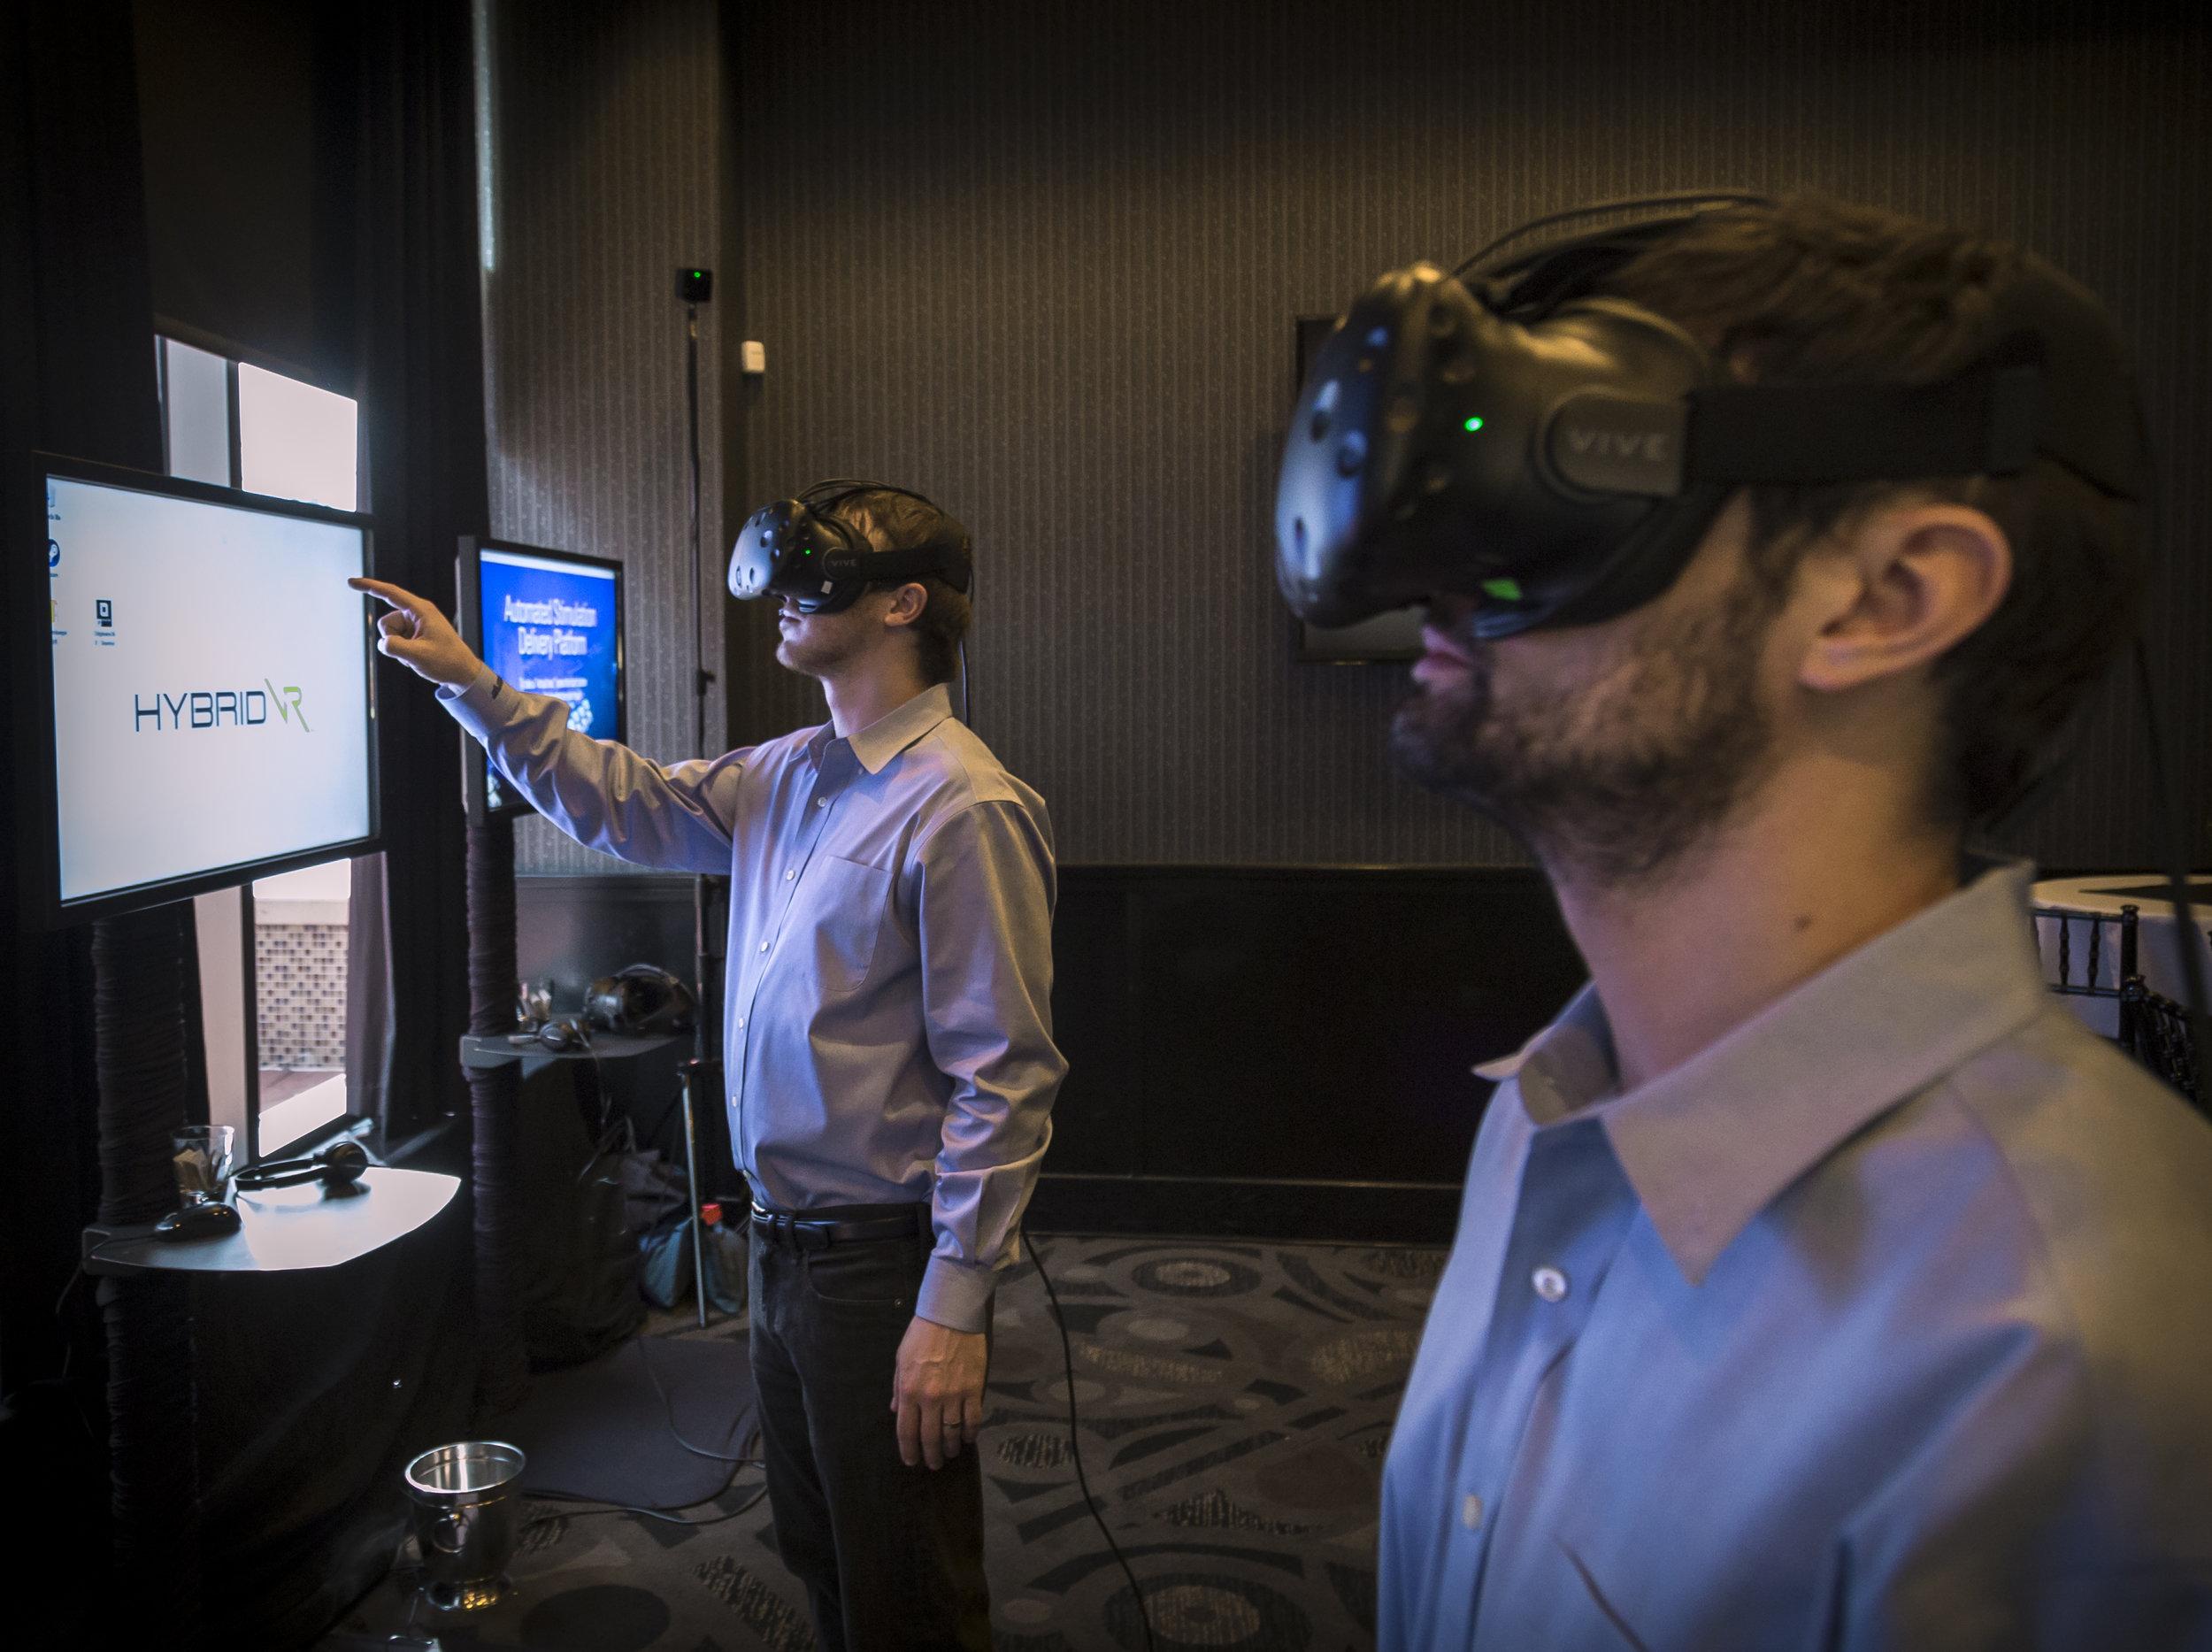 VR Techs testing